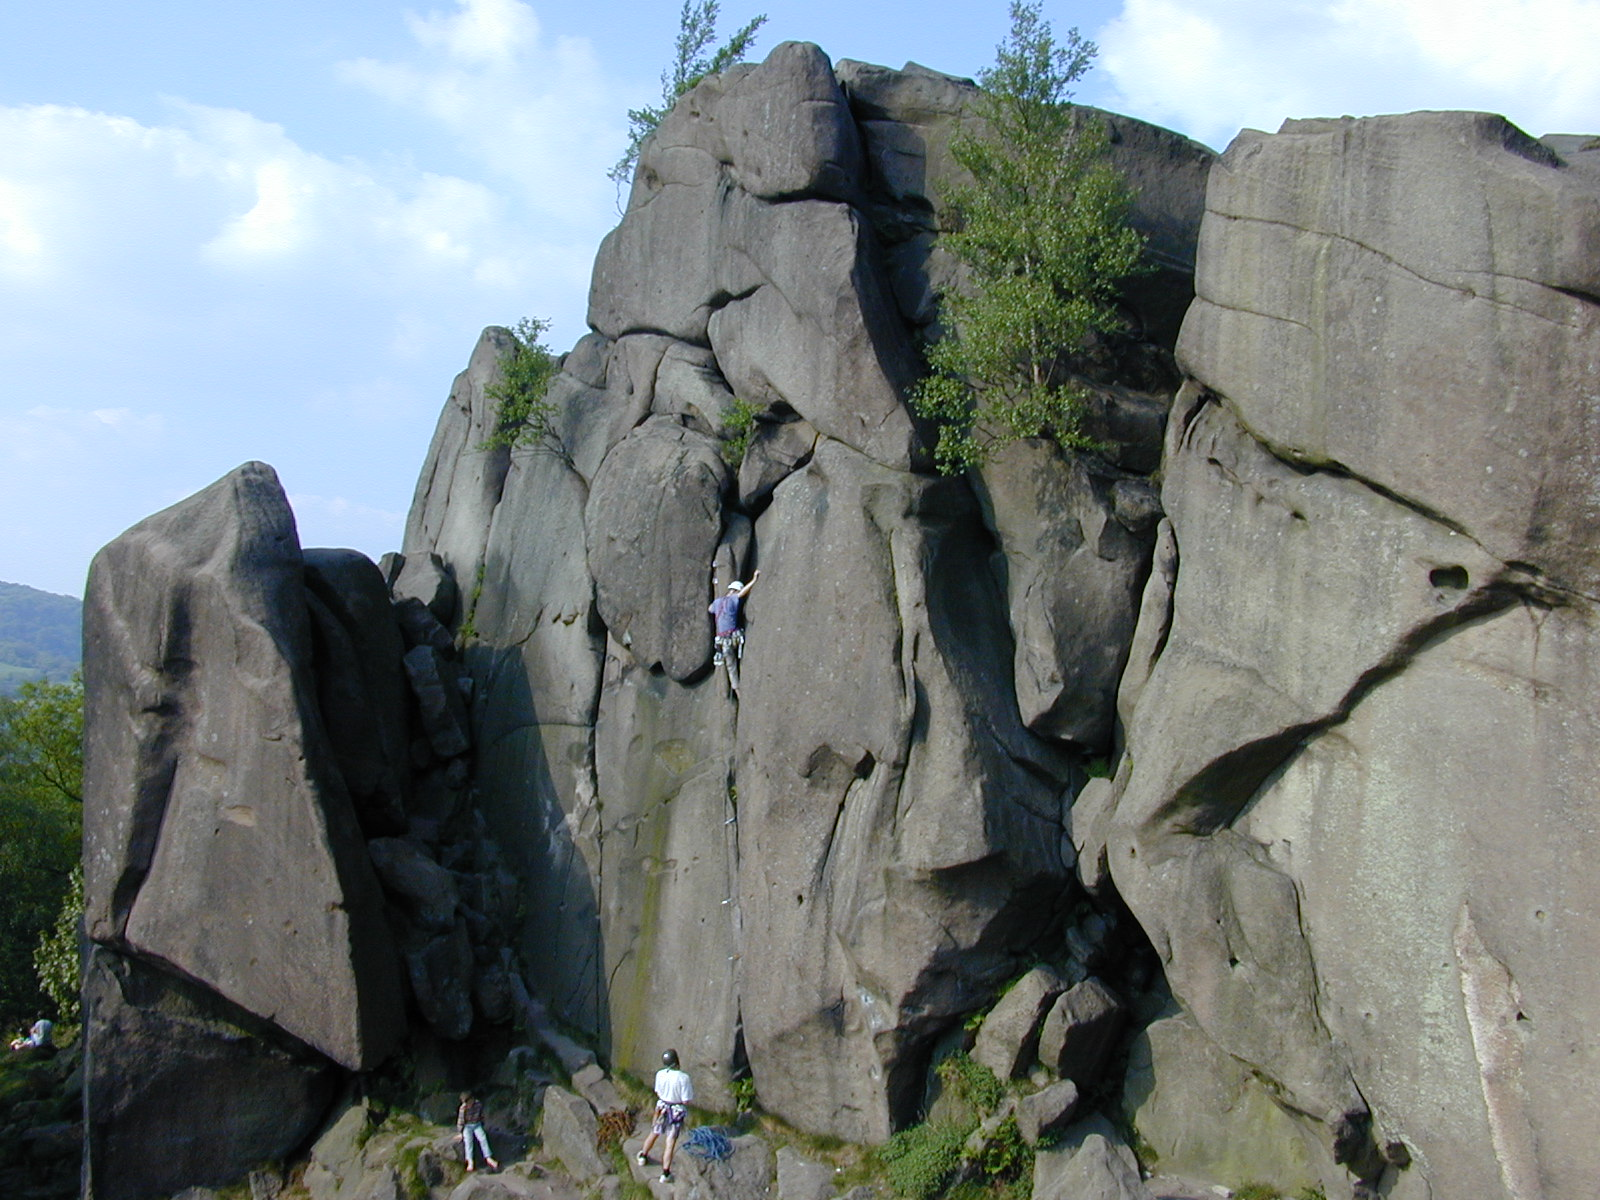 Best Rock Climbing Shoes For Morton S Toe